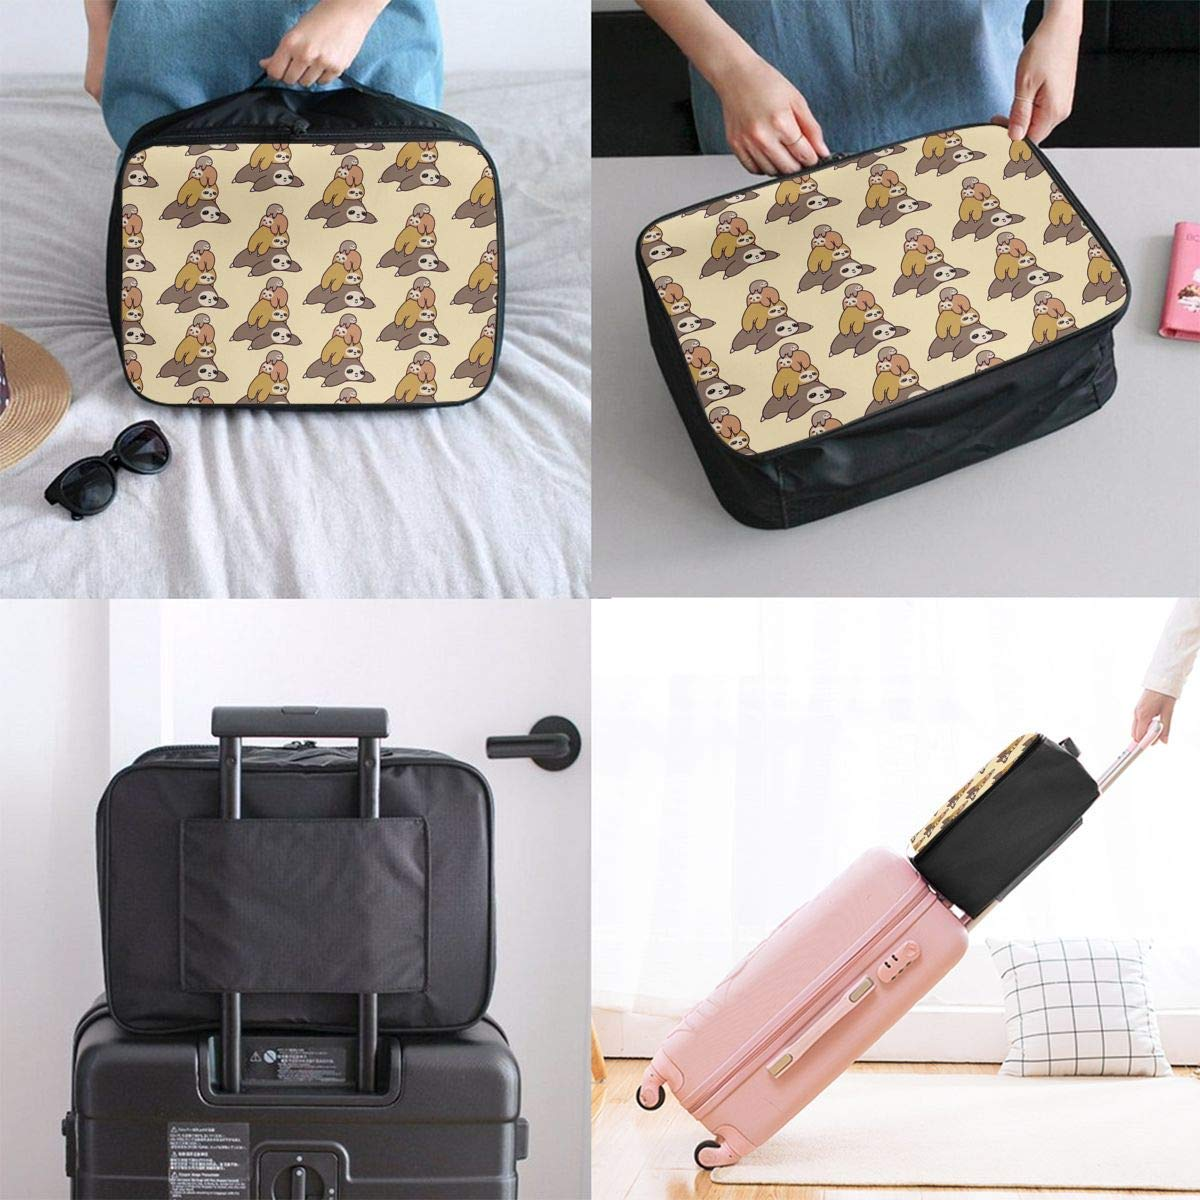 Travel Duffel Bag Waterproof Fashion Lightweight Large Capacity Portable Duffel Bag for Men /& Women JTRVW Luggage Bags for Travel Cute Sloth